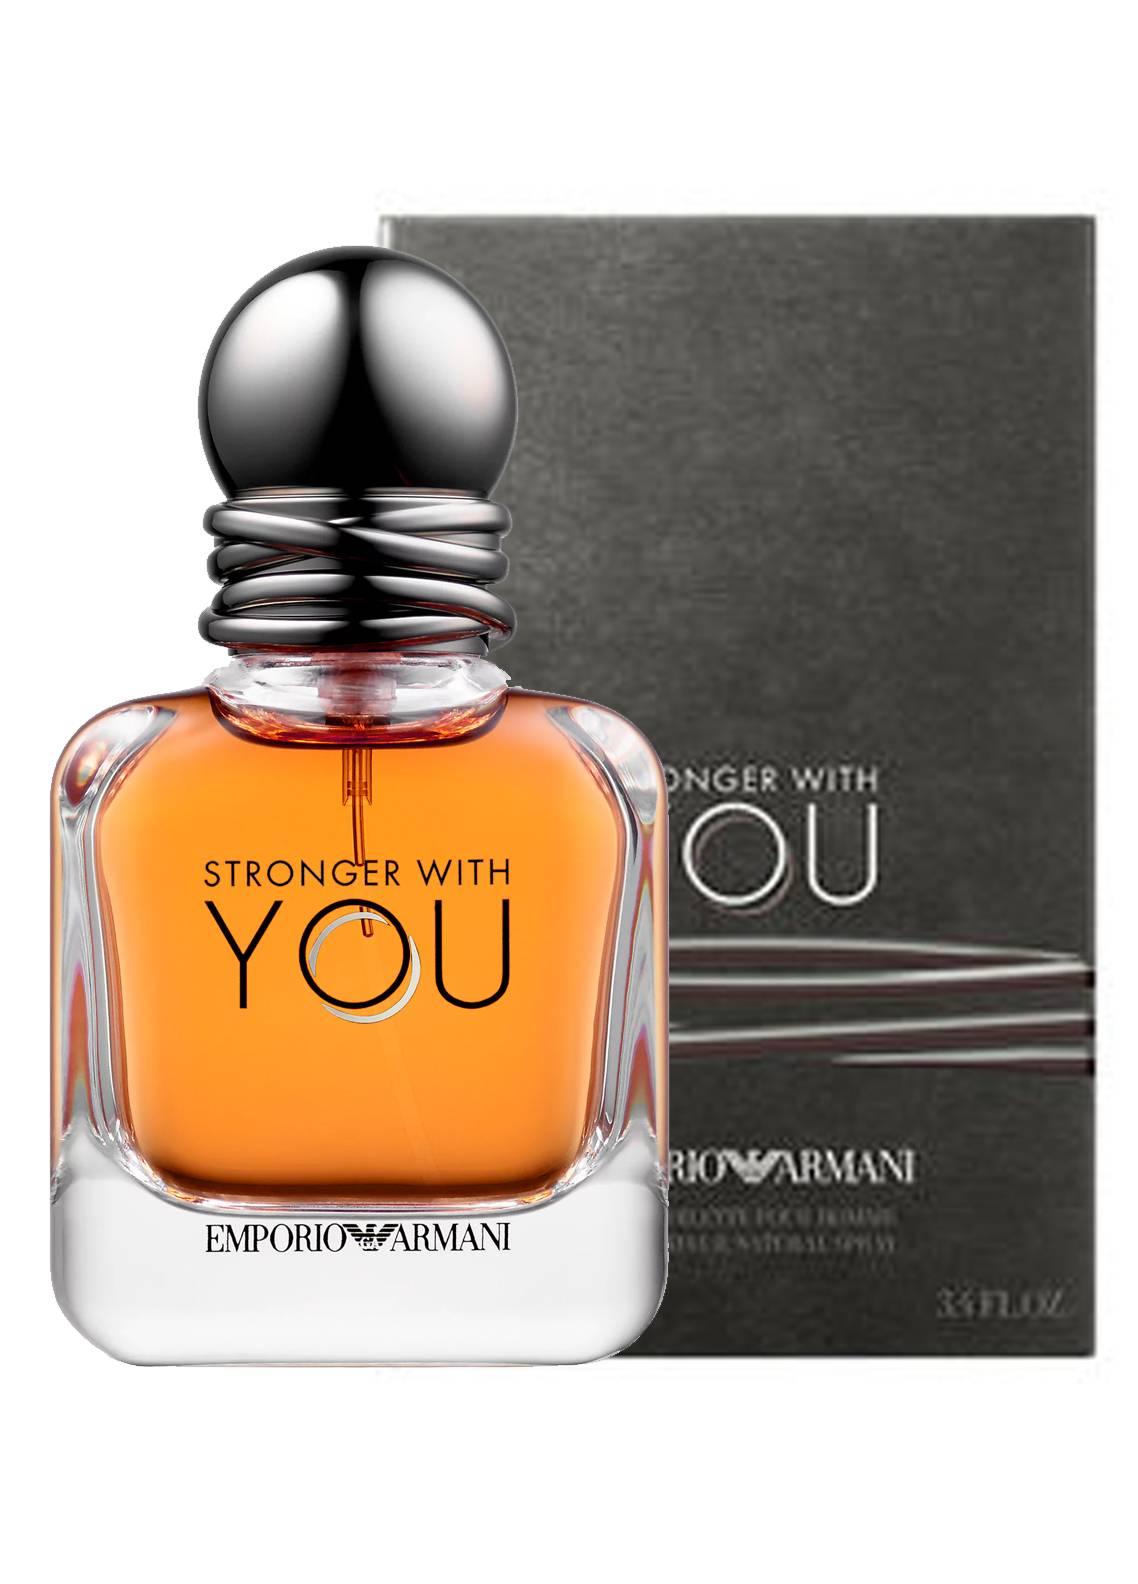 Armani Edt You Perfume Men's Pakistan With Deals Online Stronger In ukPXiOZT